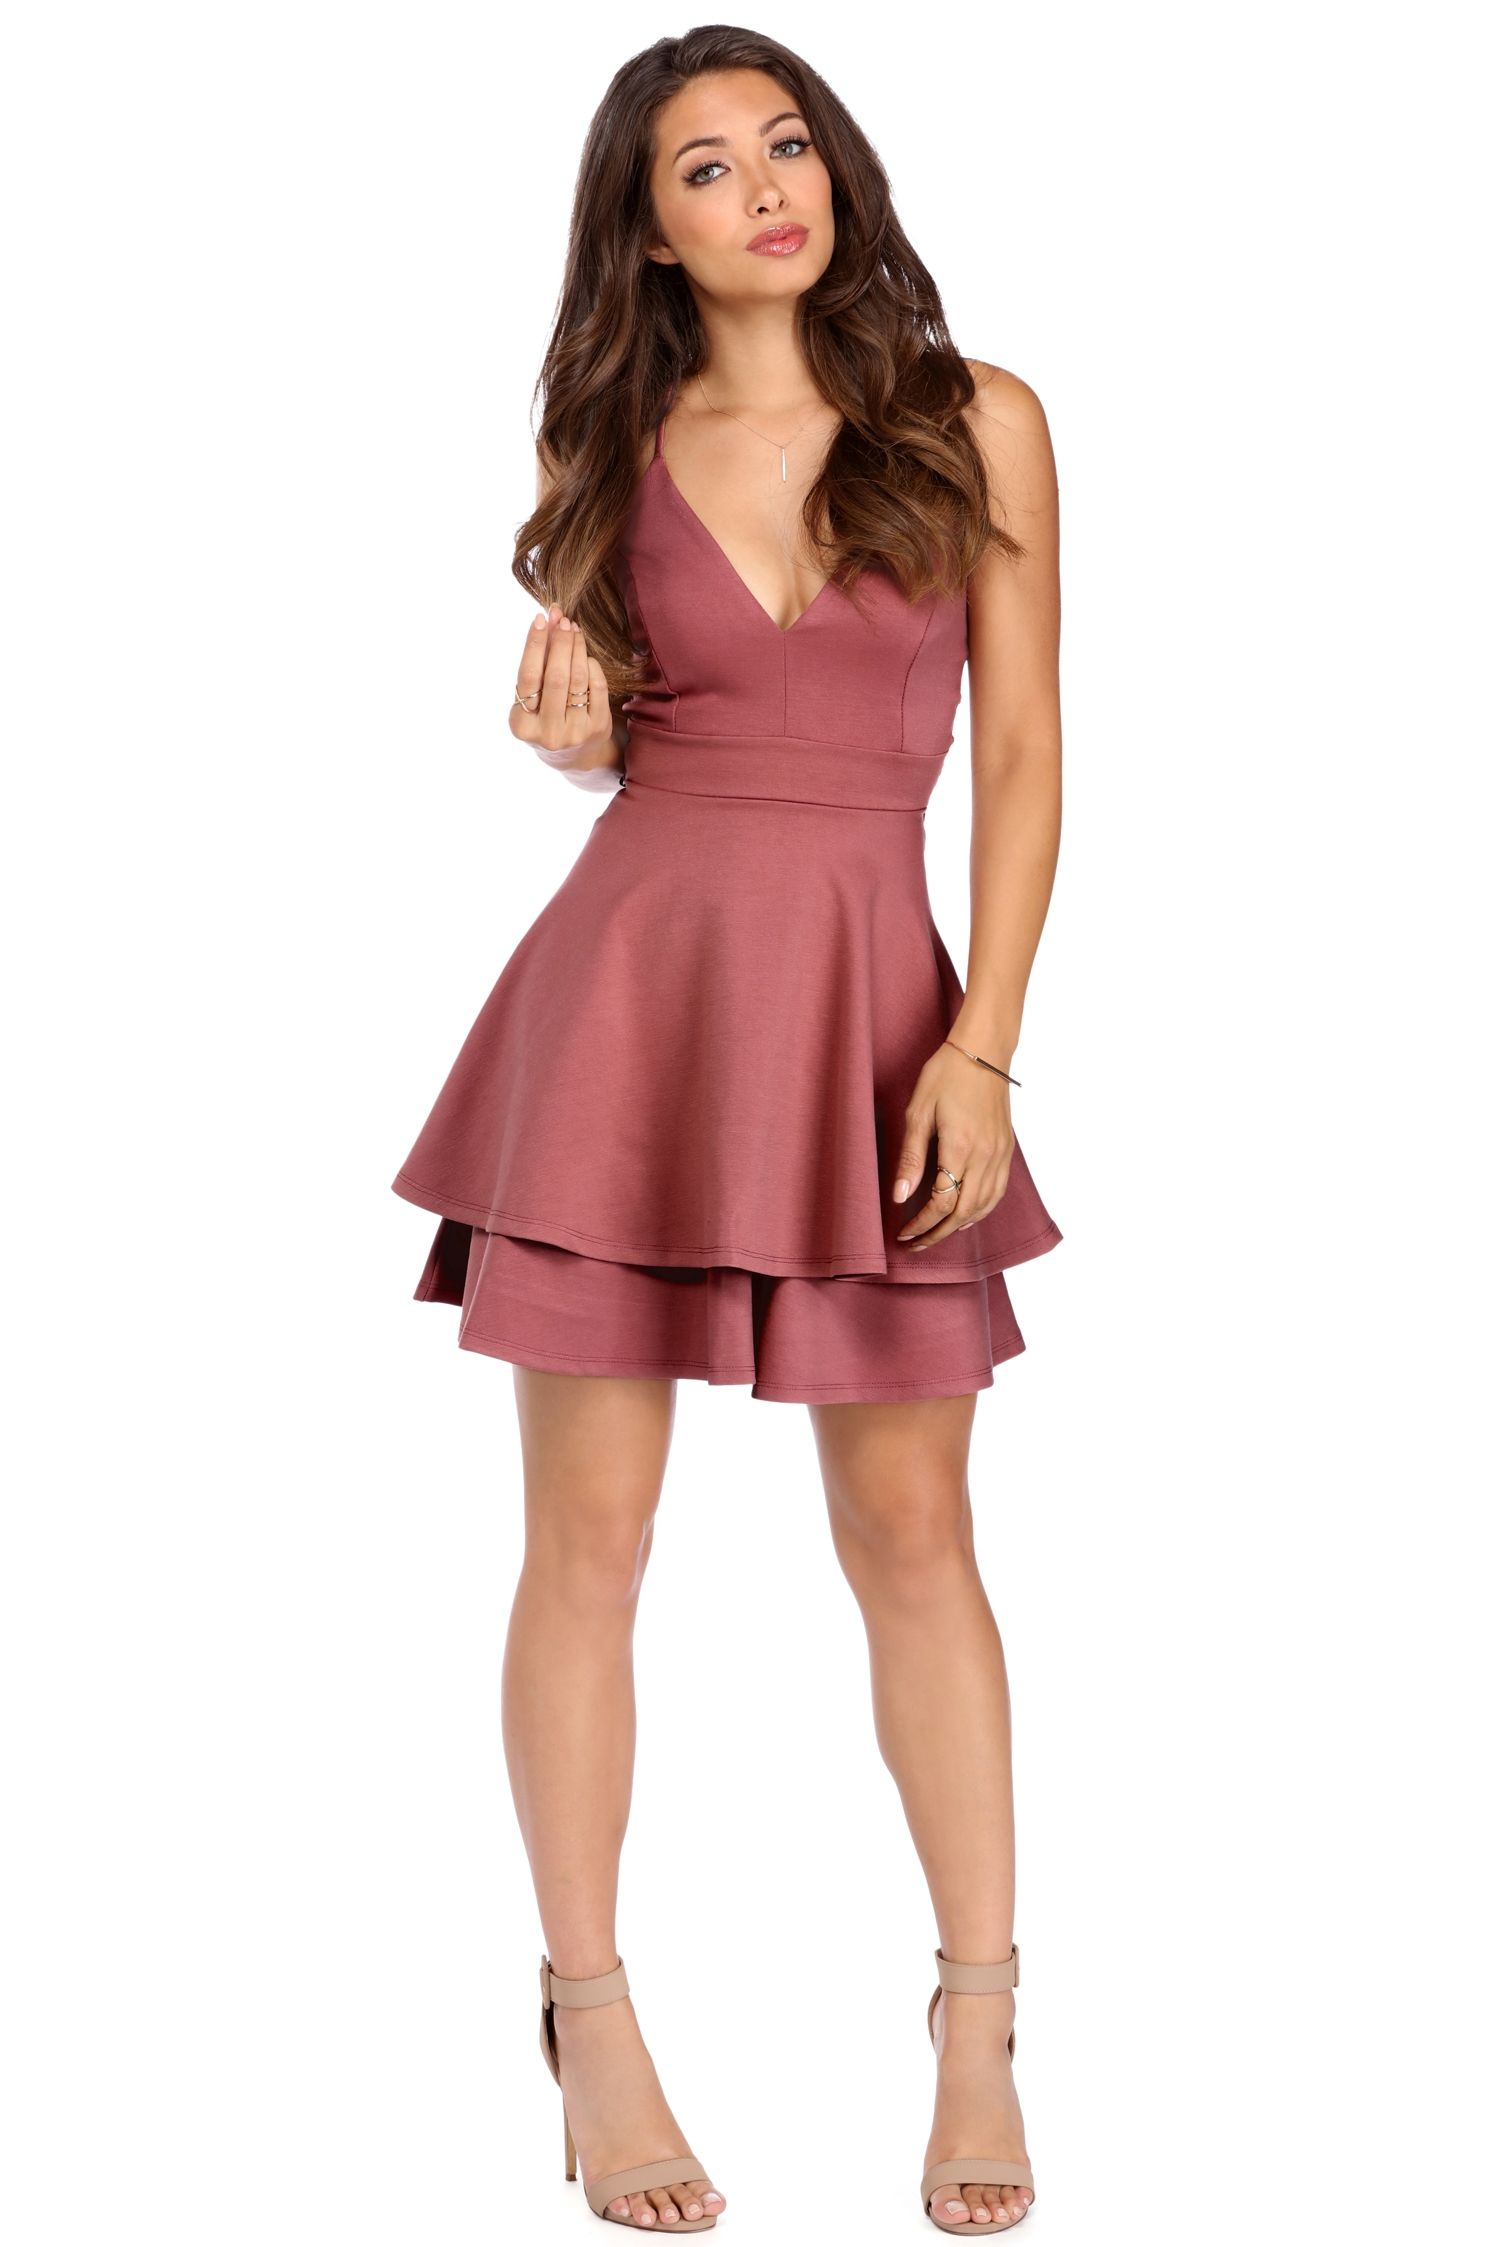 Mauve Late Night Fantasy Dress Dresses Fantasy Dress Pretty Dresses [ 2247 x 1500 Pixel ]